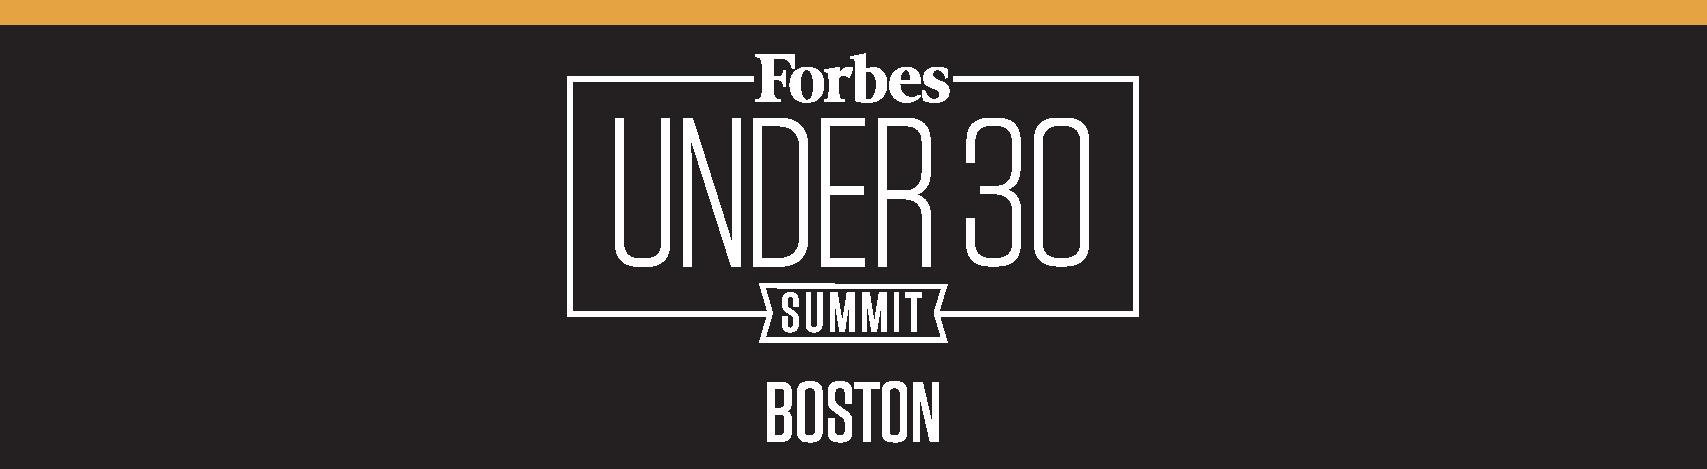 Under30Summit_Boston_LoadingHeader_Final.jpg